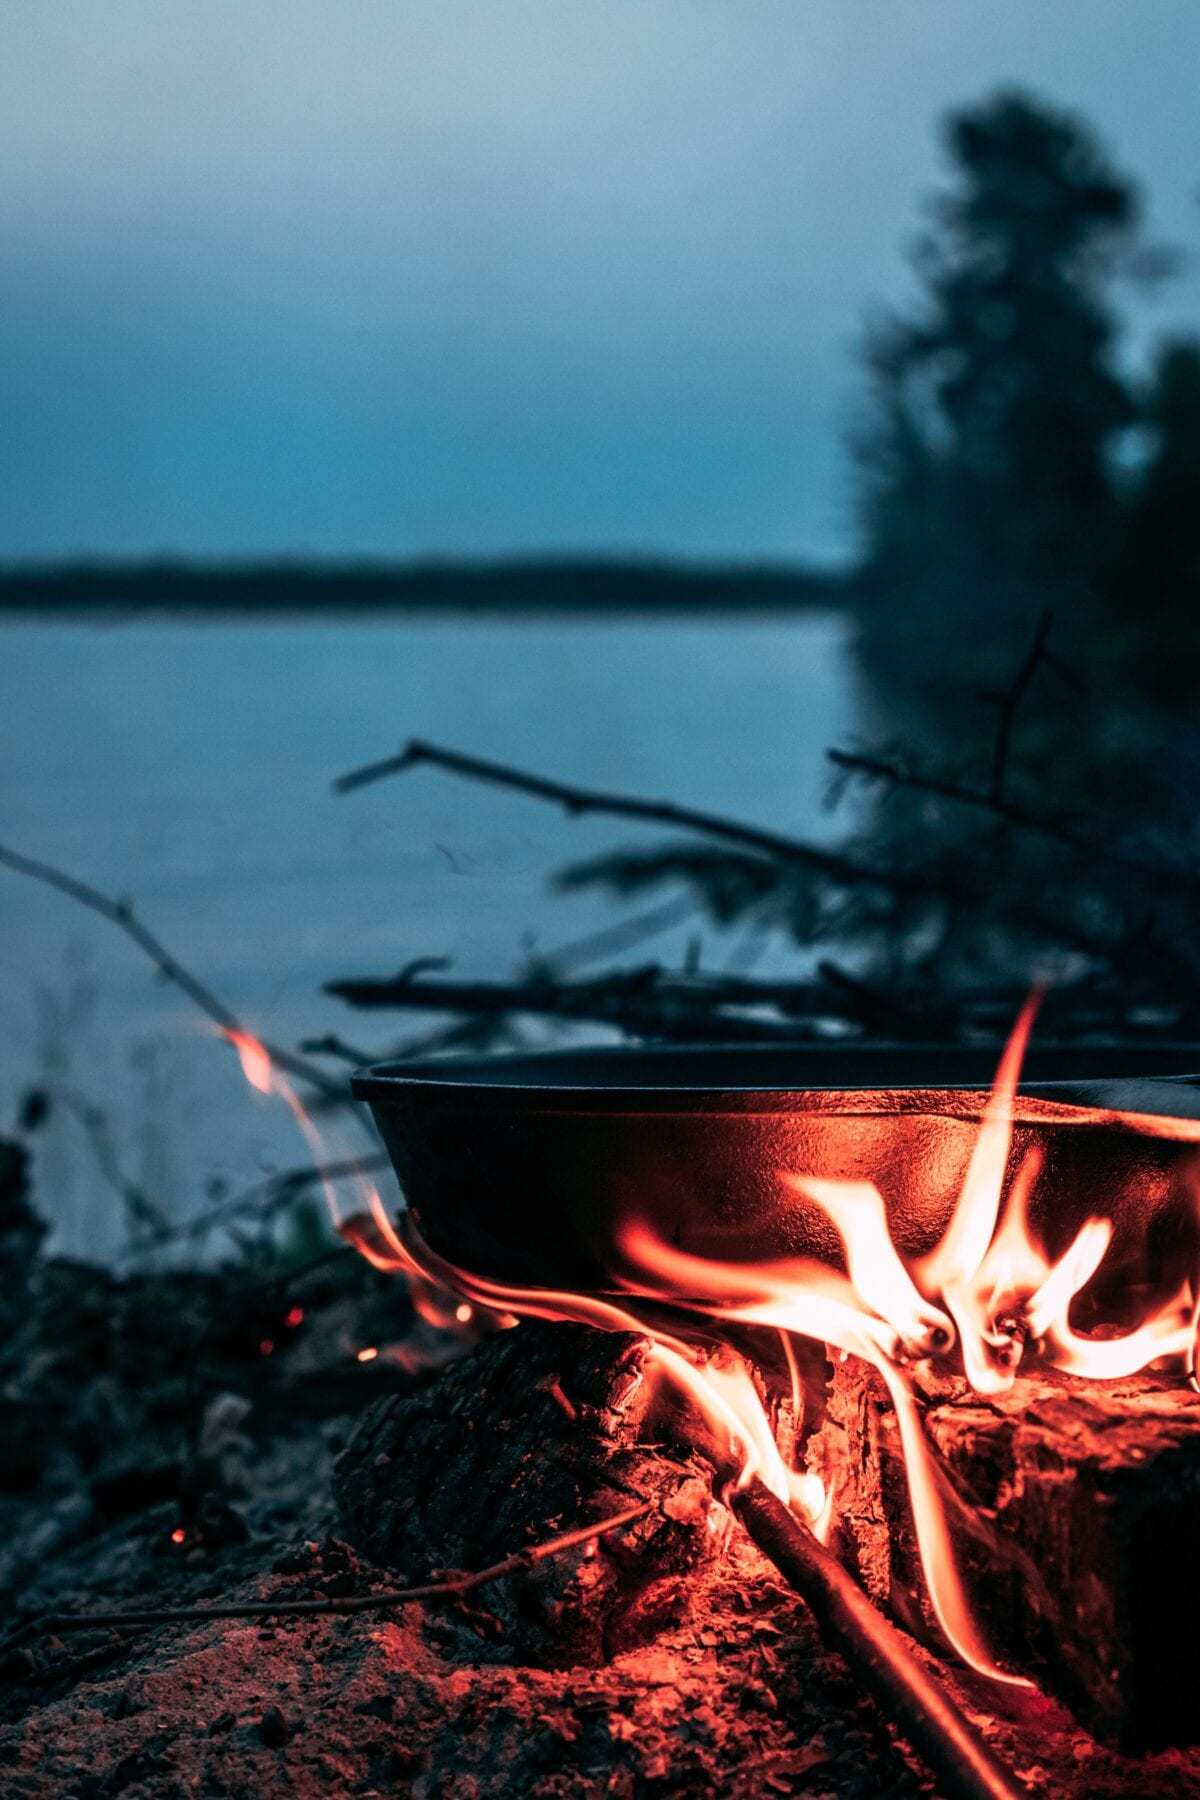 Koken op vuur Dutch Oven